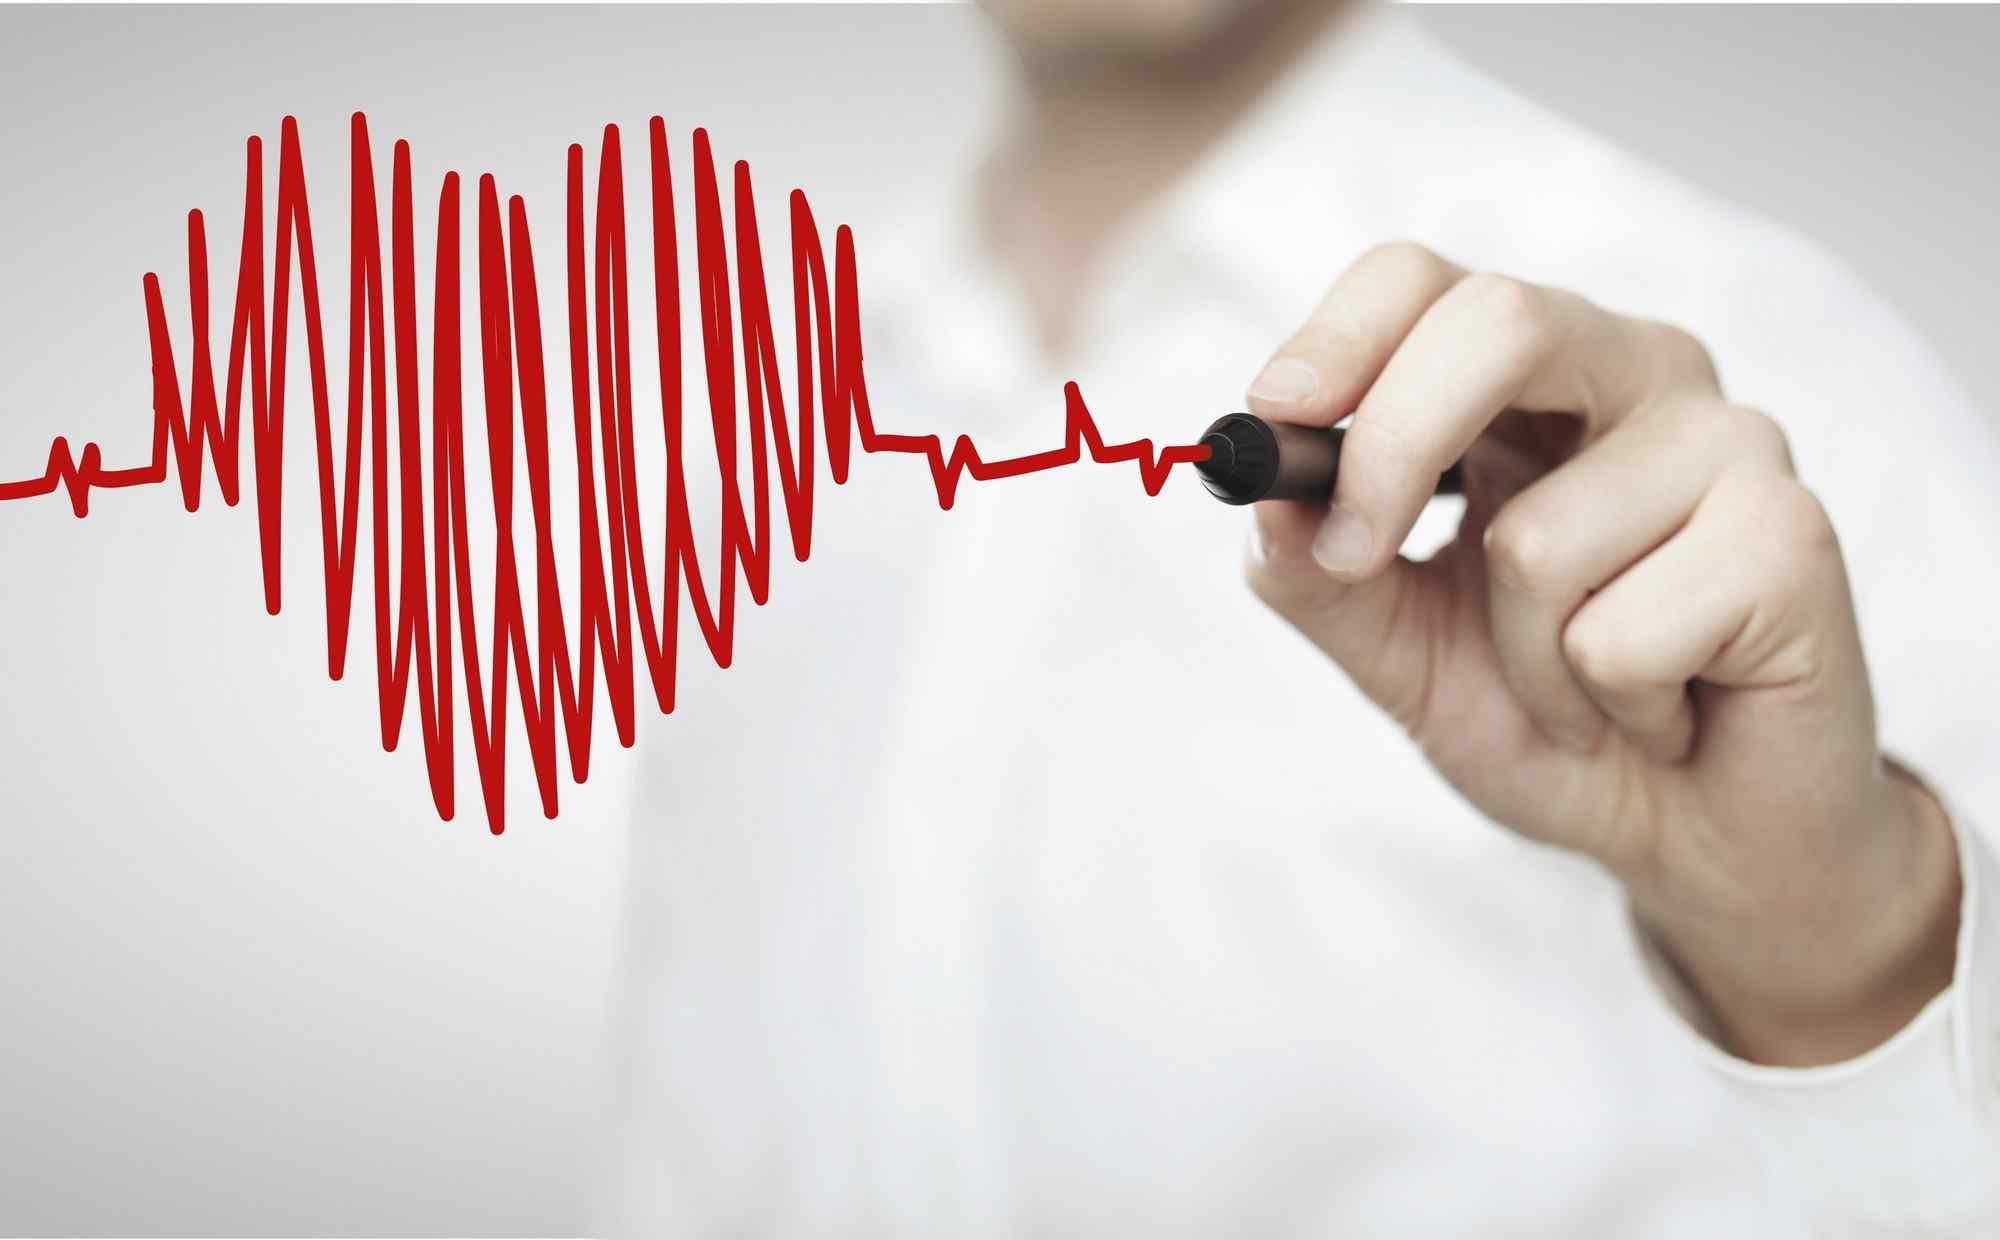 heart-health-1.jpg